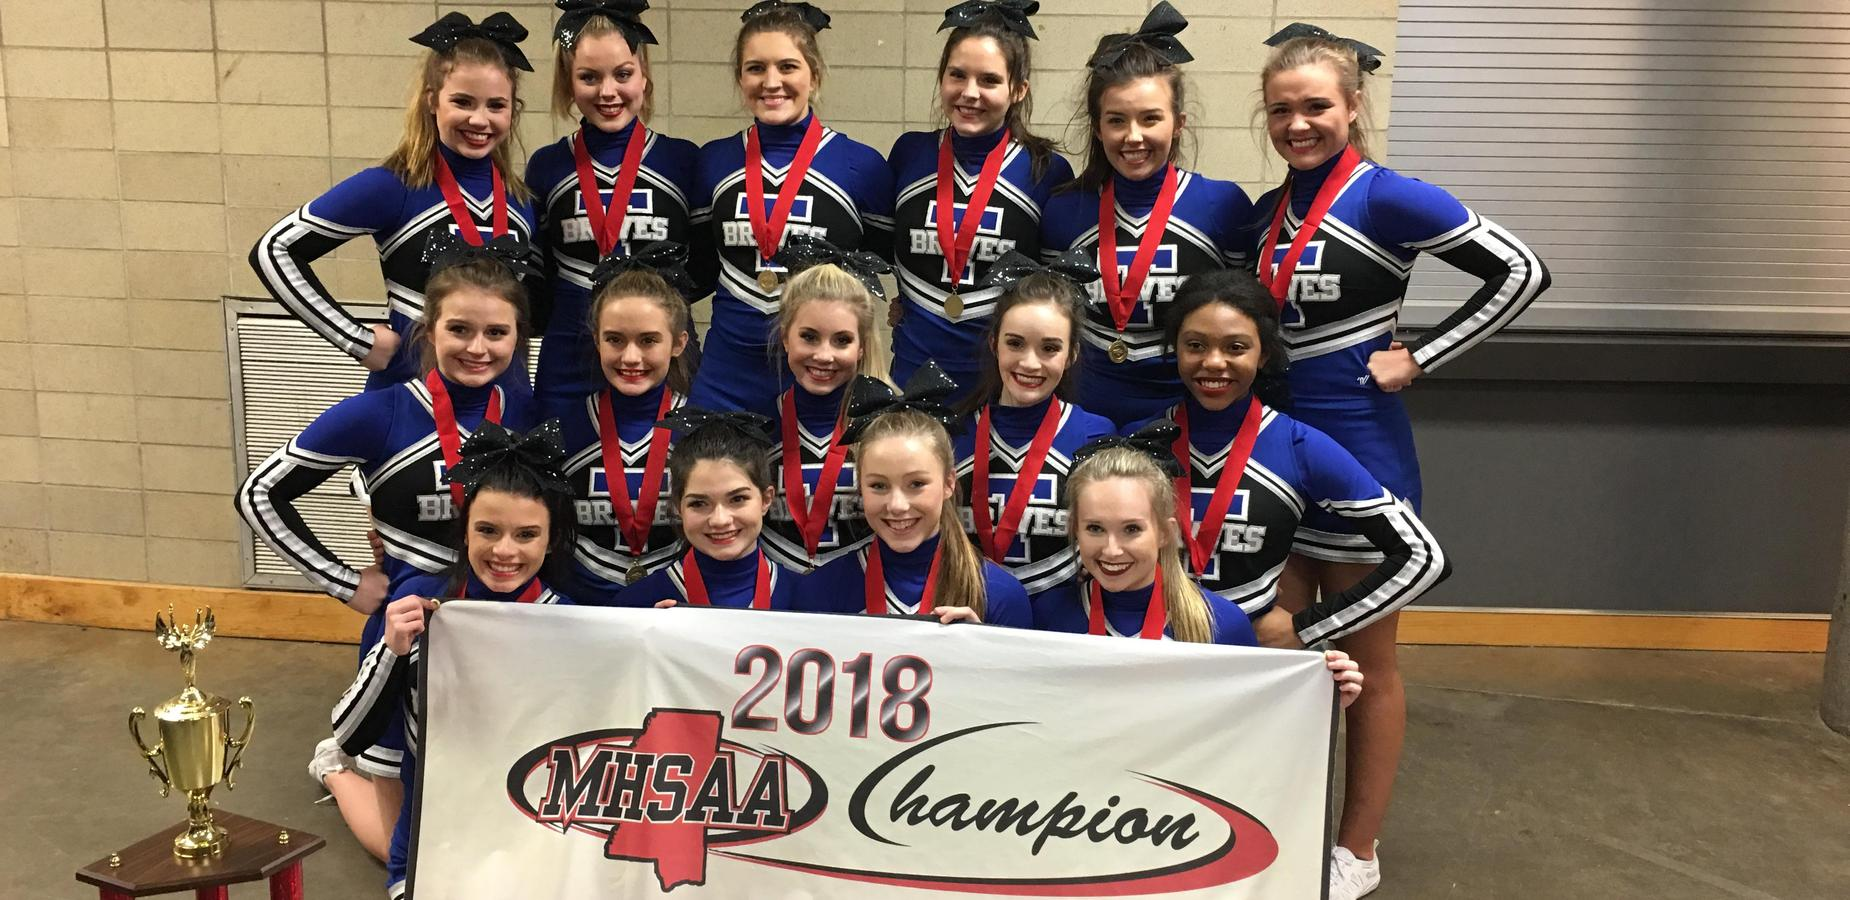 TCHS Cheerleaders Win State!